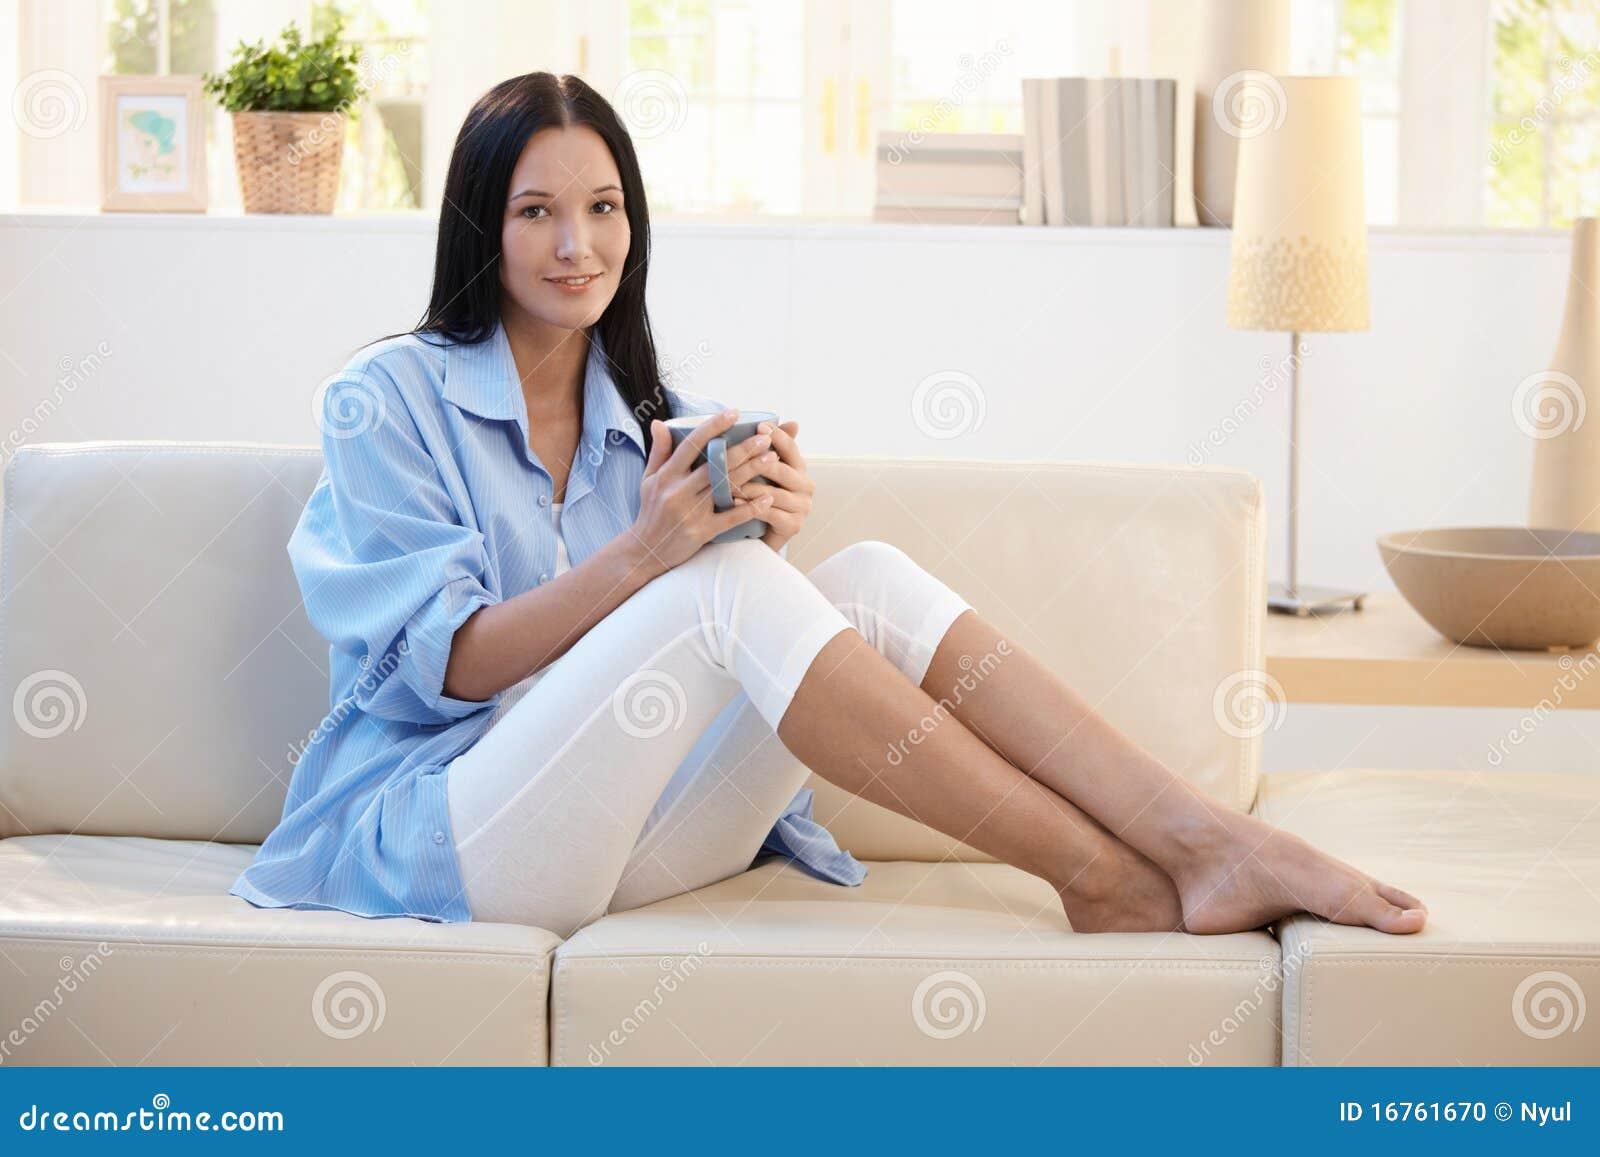 Portret van glimlachende vrouw die koffie op bank heeft